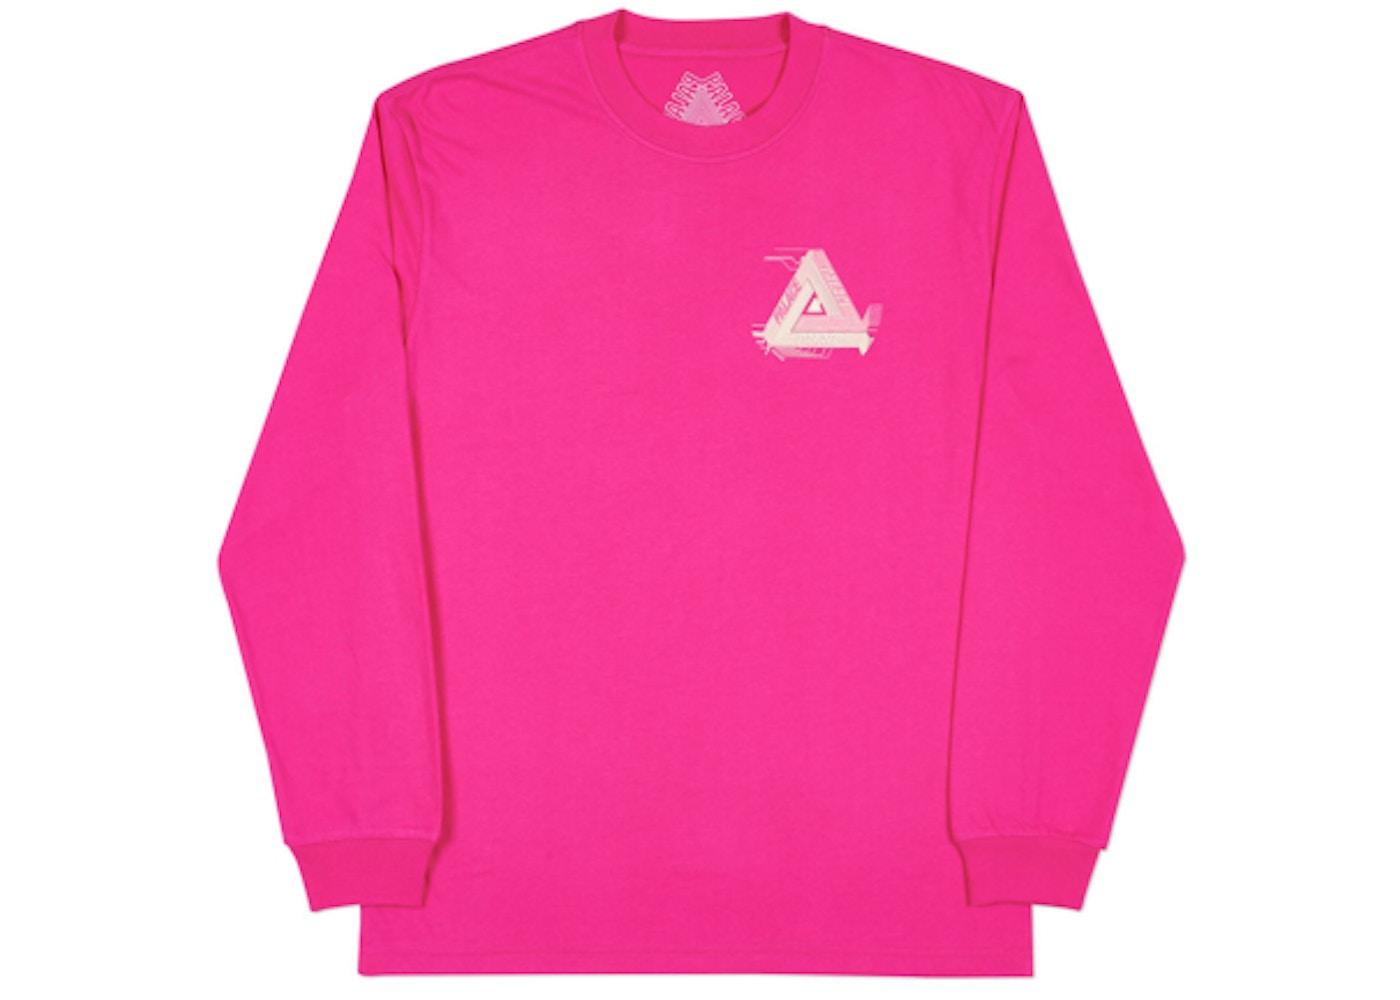 0afca7ec328f Palace Surkit Longsleeve Hot Pink Grey - Spring 2018